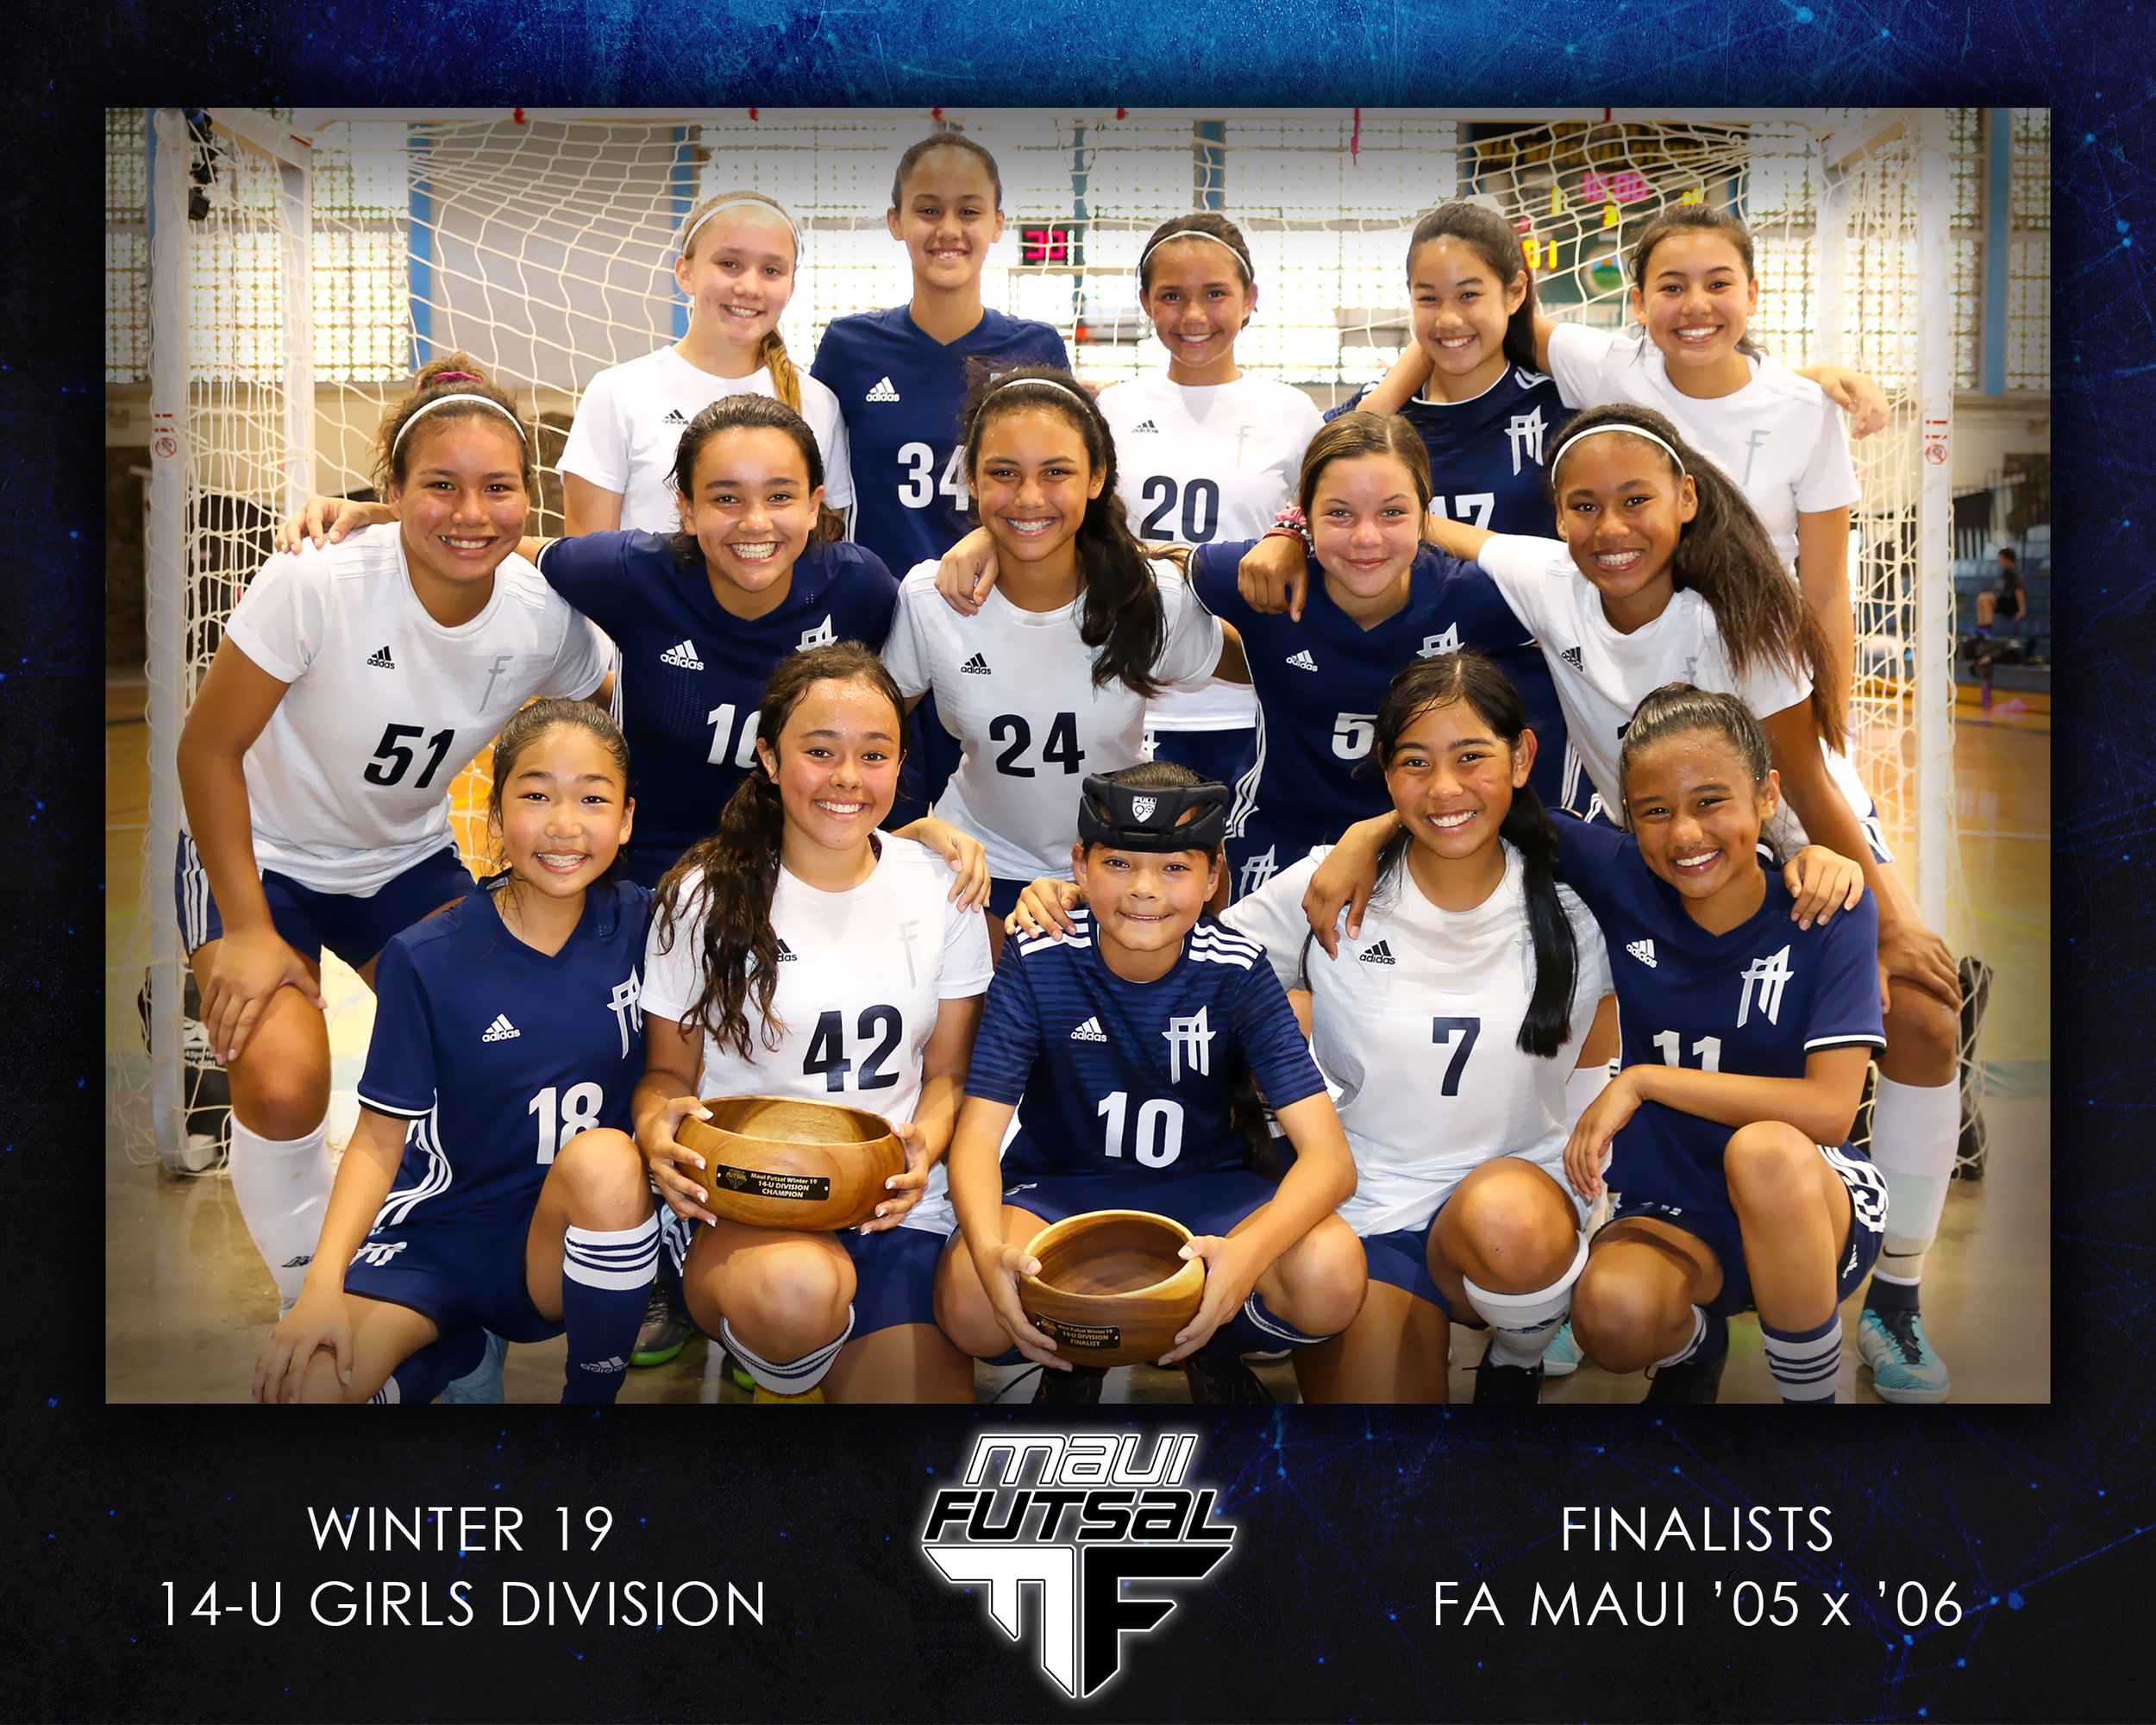 CHAMPIONS: FA Maui '05 Girls | RUNNER-UP: FA Maui '06 Girls